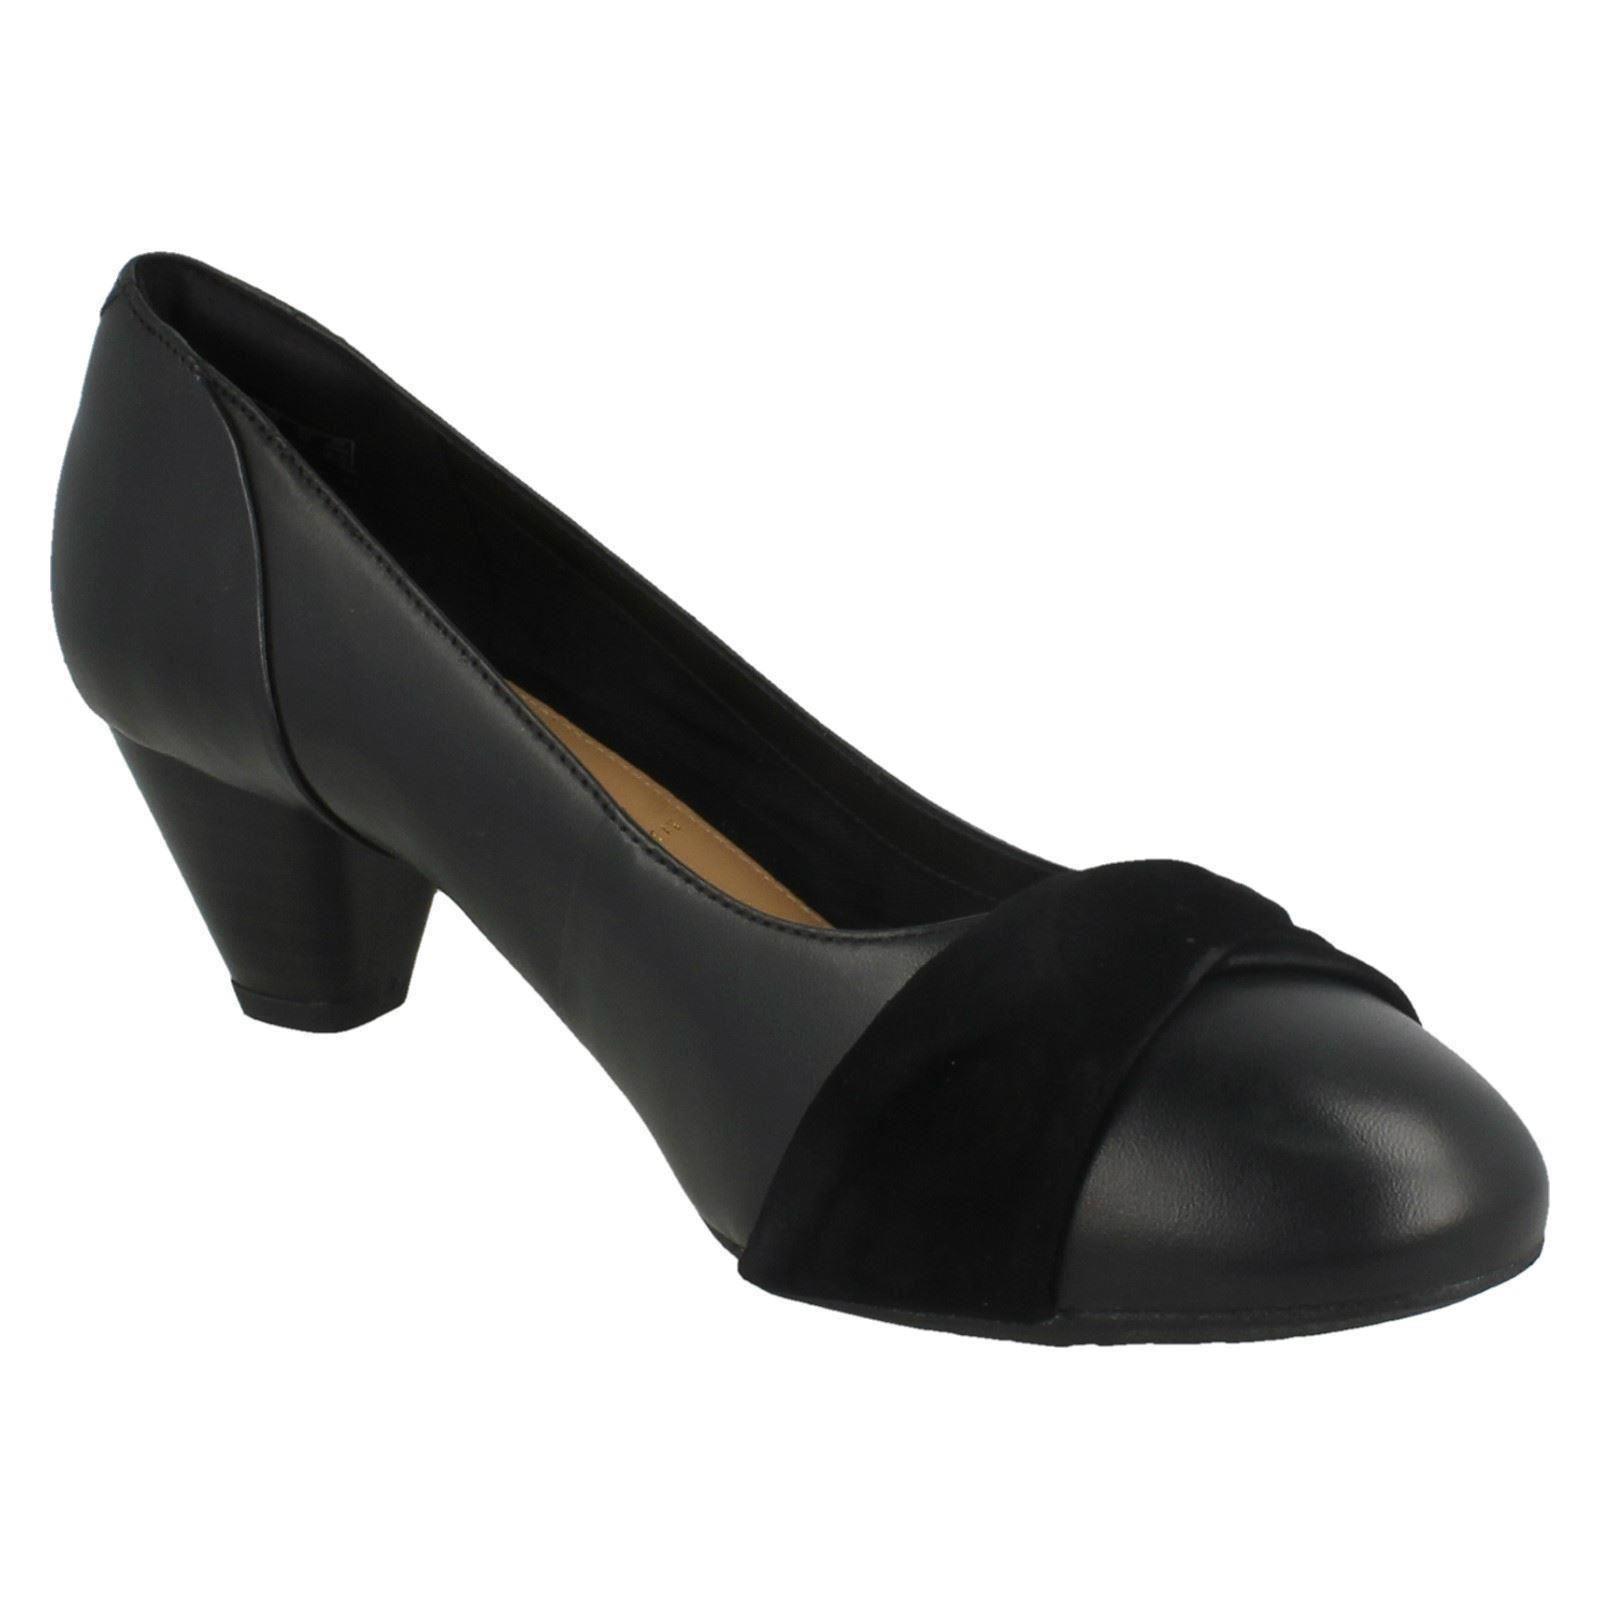 mesdames clarks talons bas intelligent chaussures / tribunal chaussures intelligent * denny louise * b93c4a